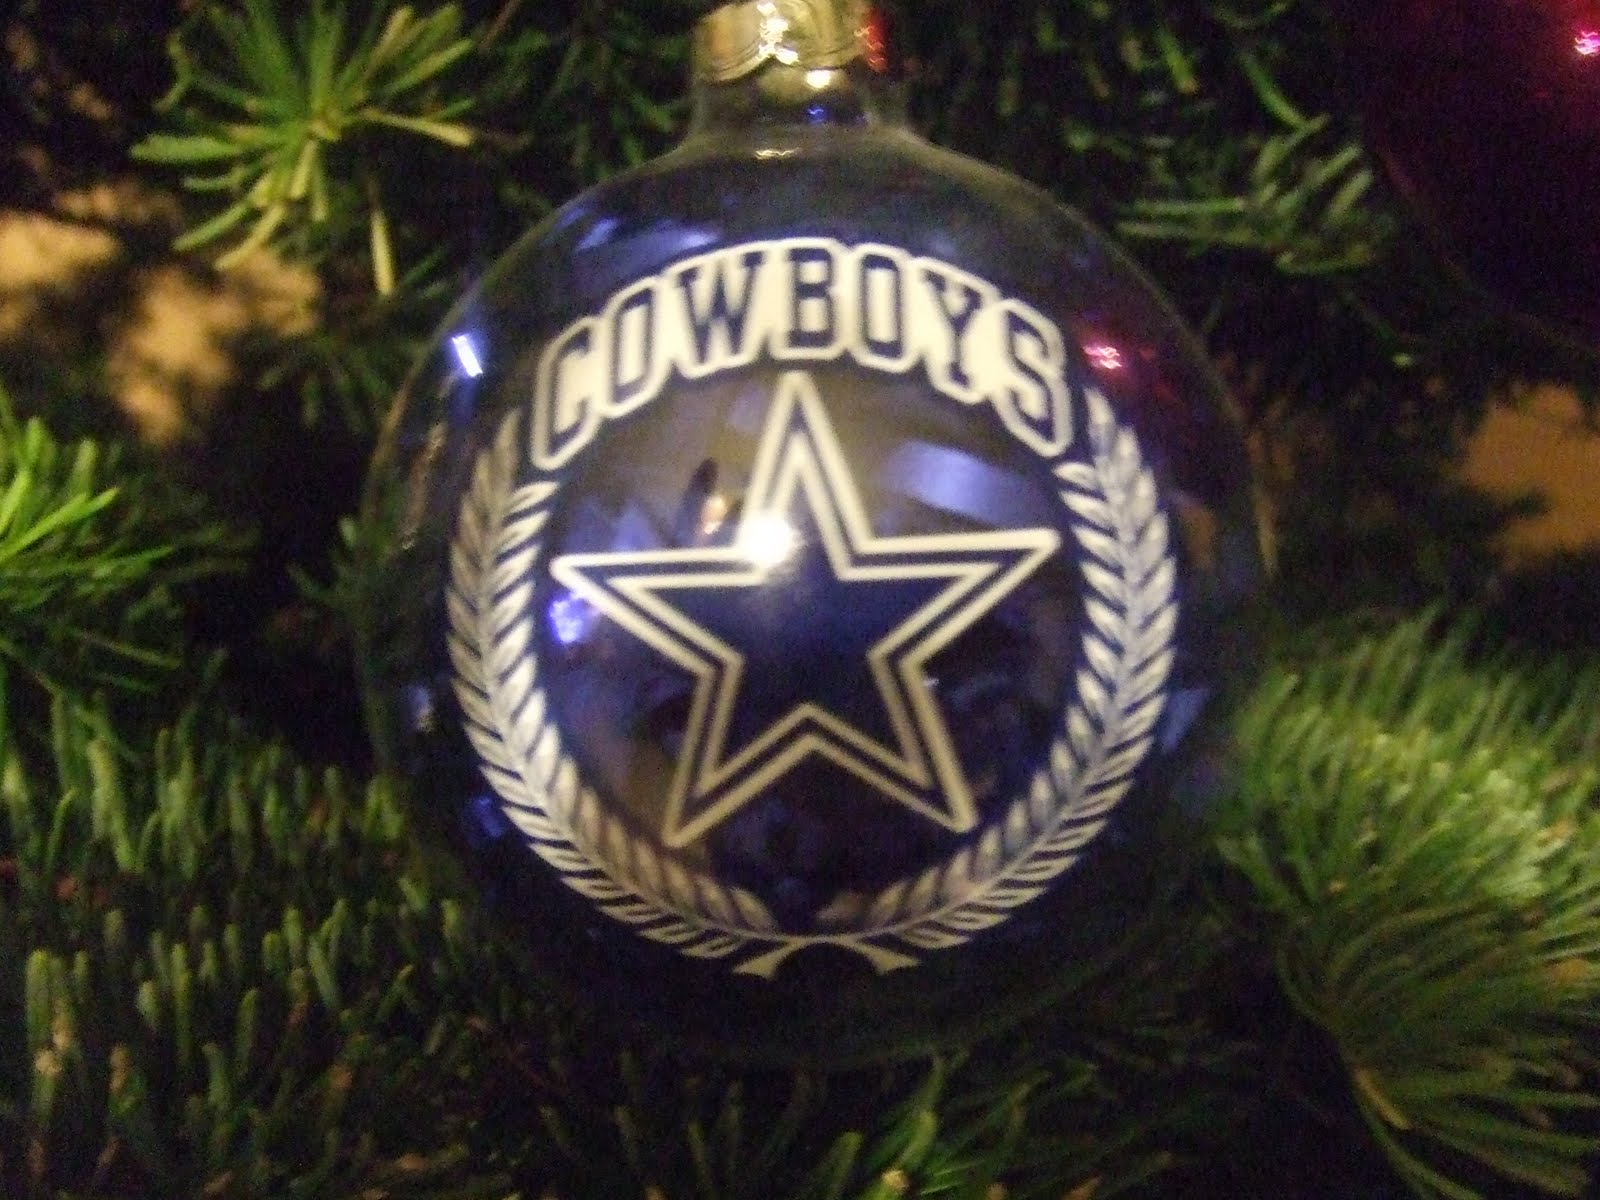 Paw Print Diaries: Our Christmas Tree - Dallas Cowboys